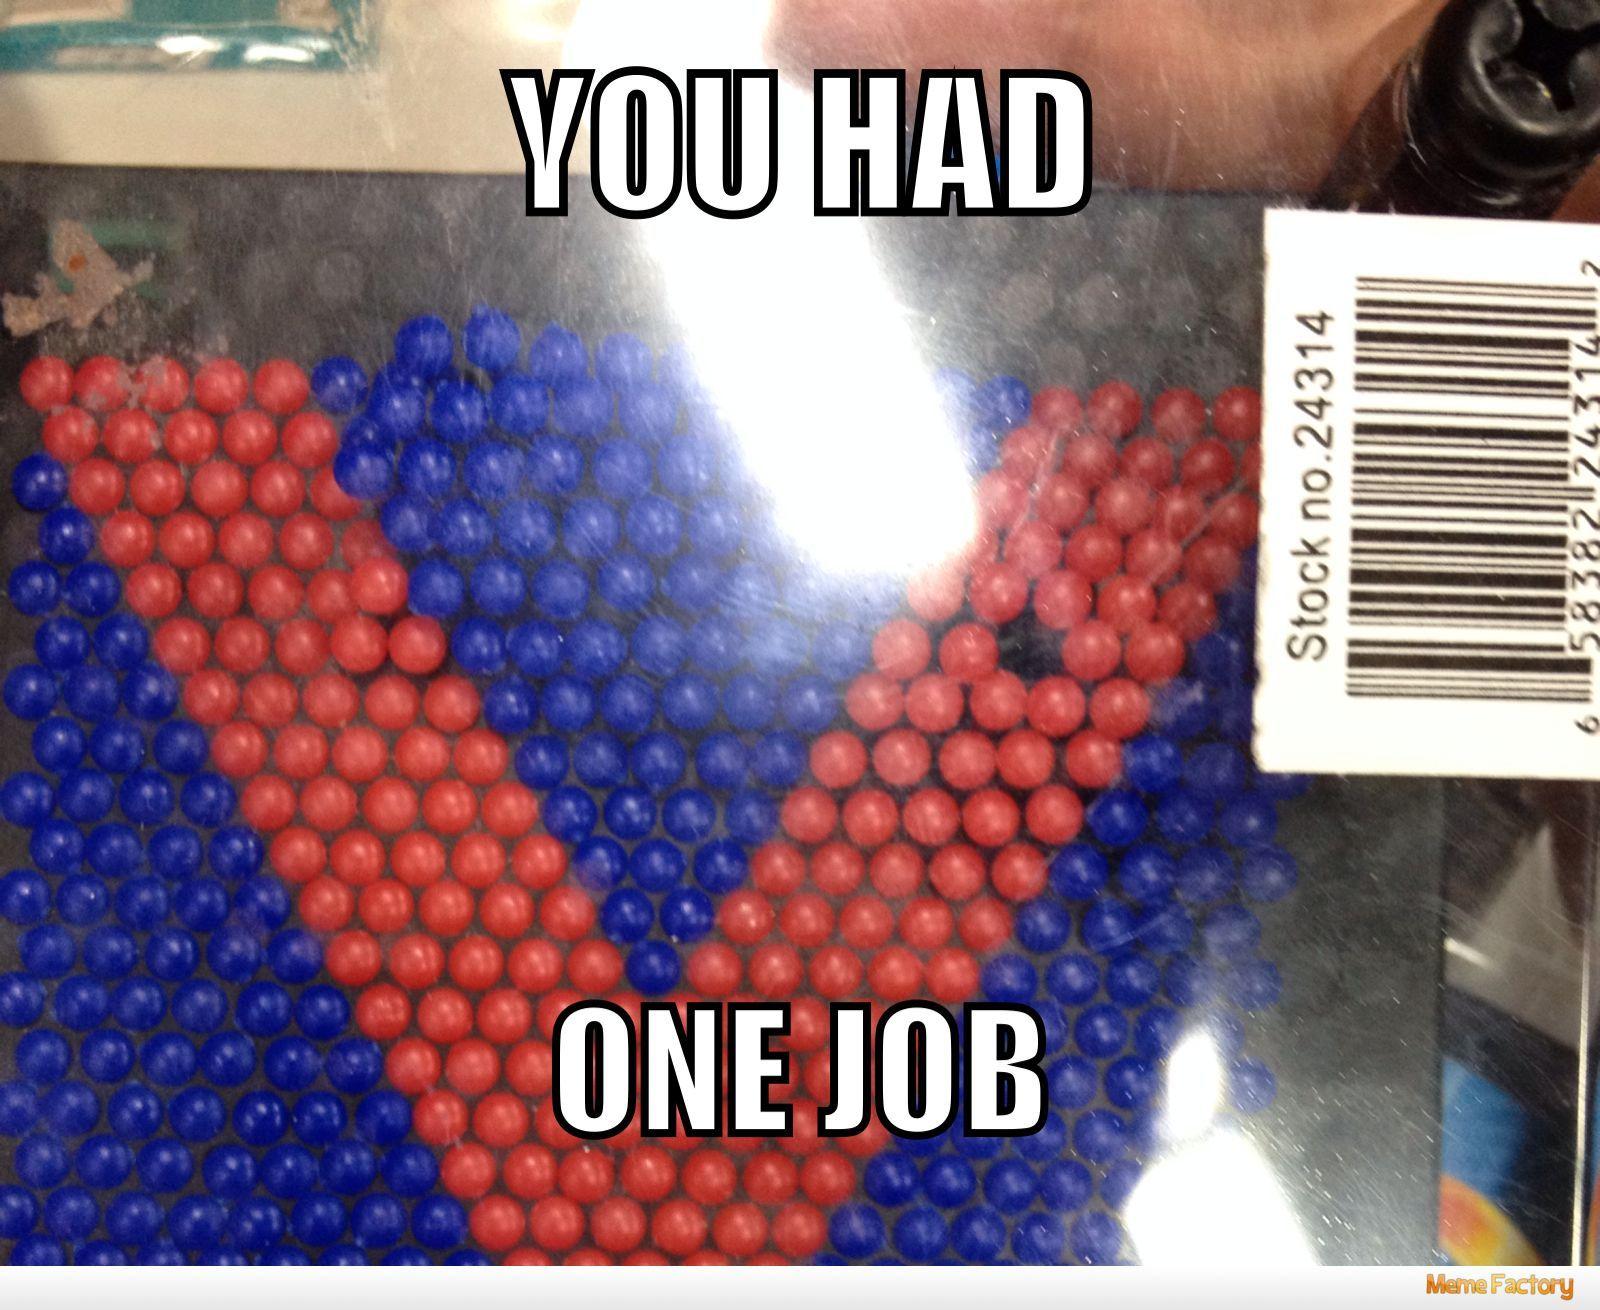 One job - meme